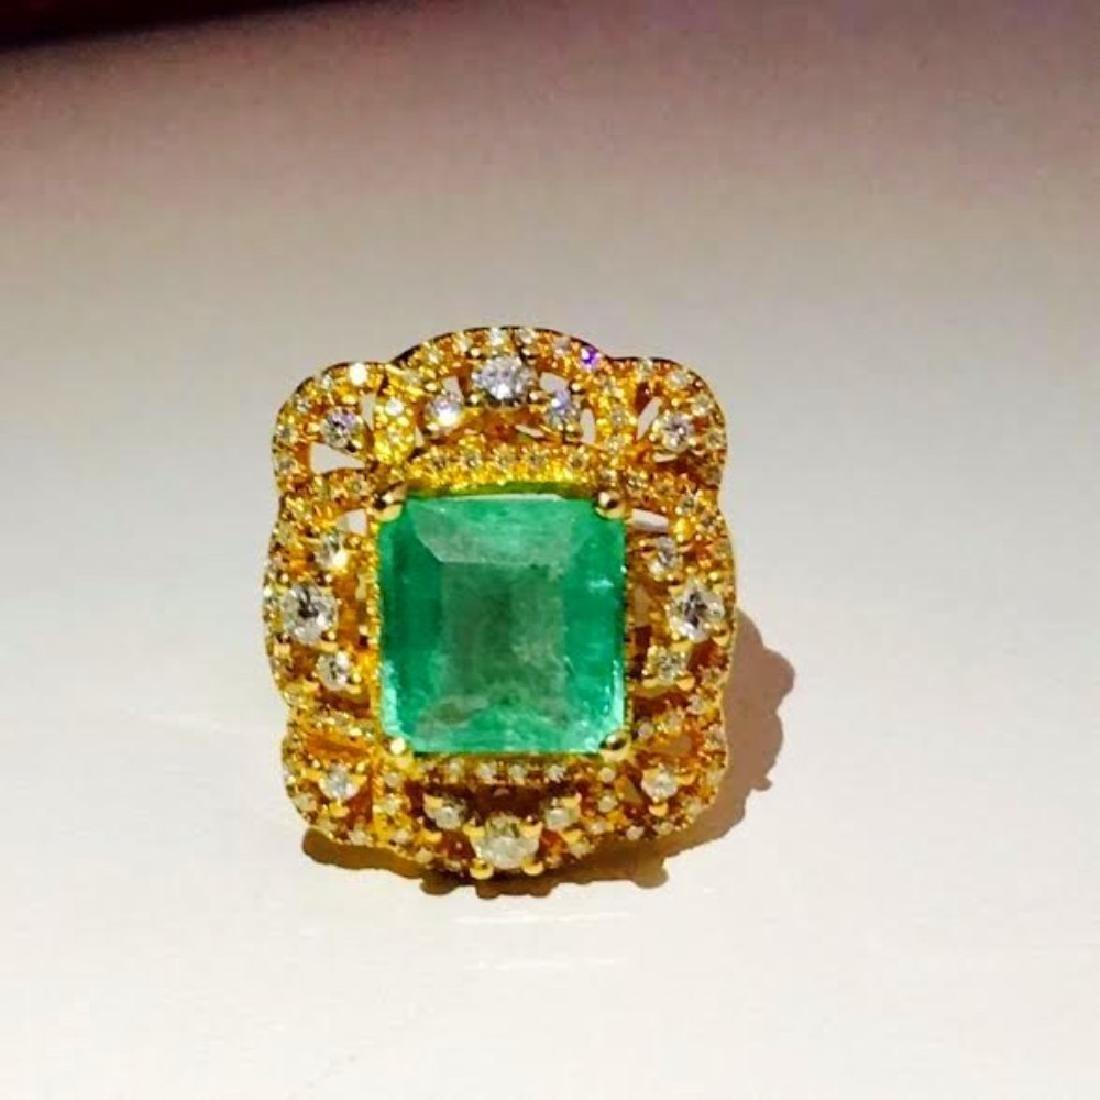 18k Gold Vintage 6 ct Emerald Diamond Cocktail Ring